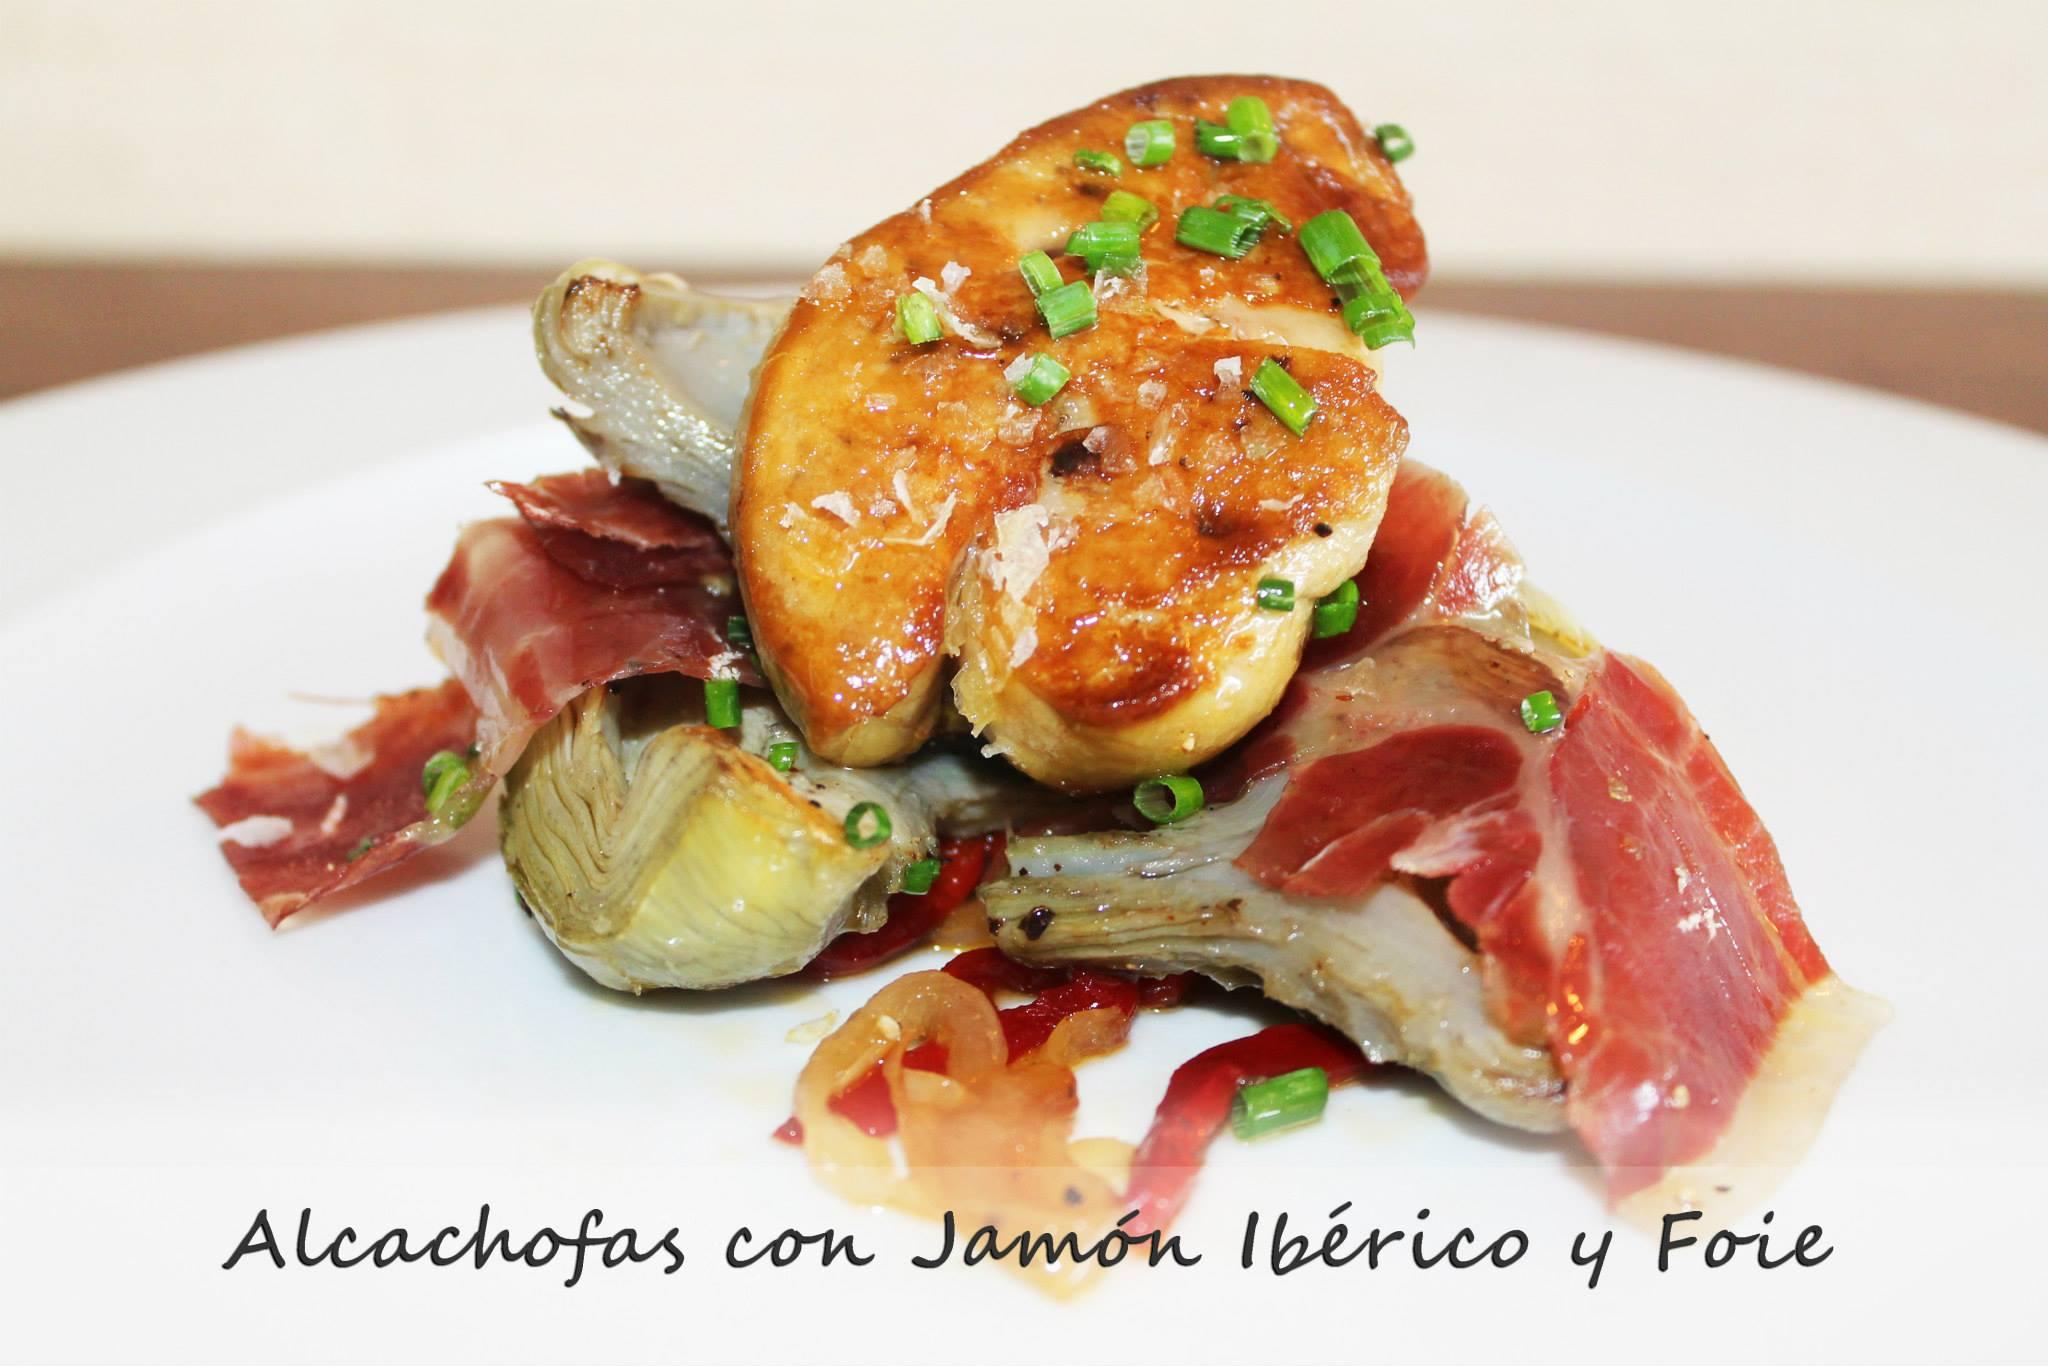 restaurante shamrock palma alcachofas con jamon iberico y foie